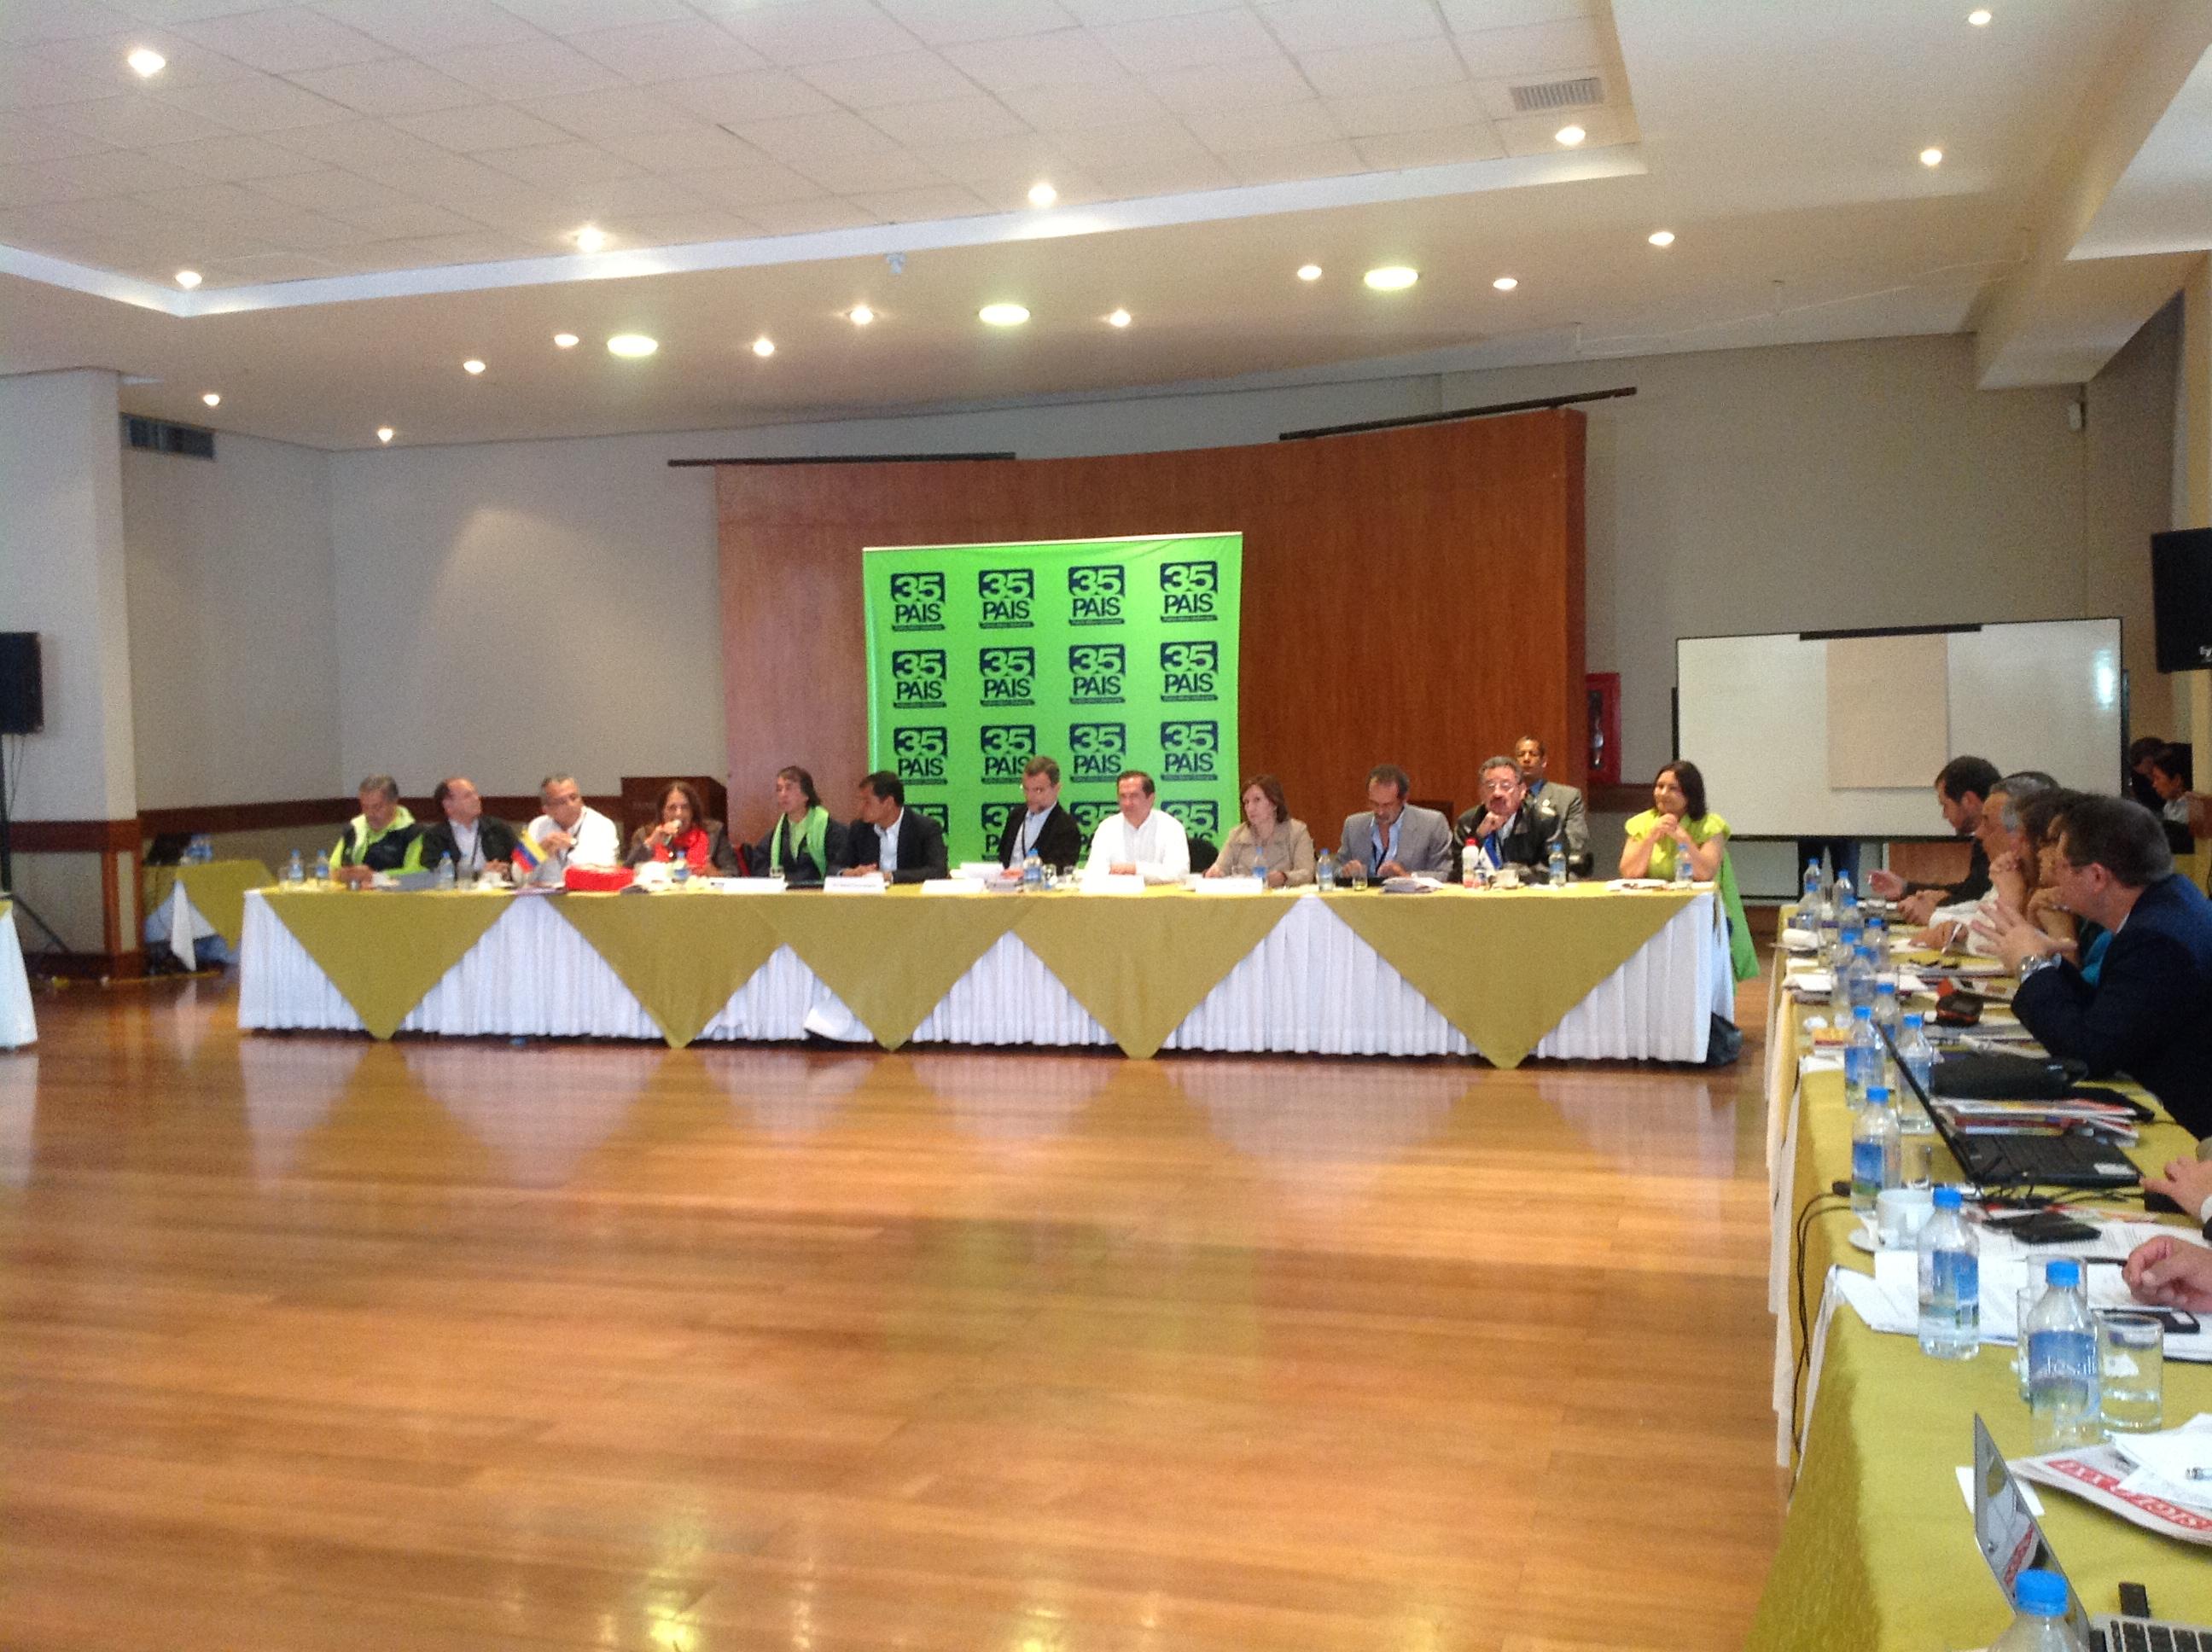 Reunião Grupo de trabajo Foro Sao Paulo, Quito. 17 enero 2013